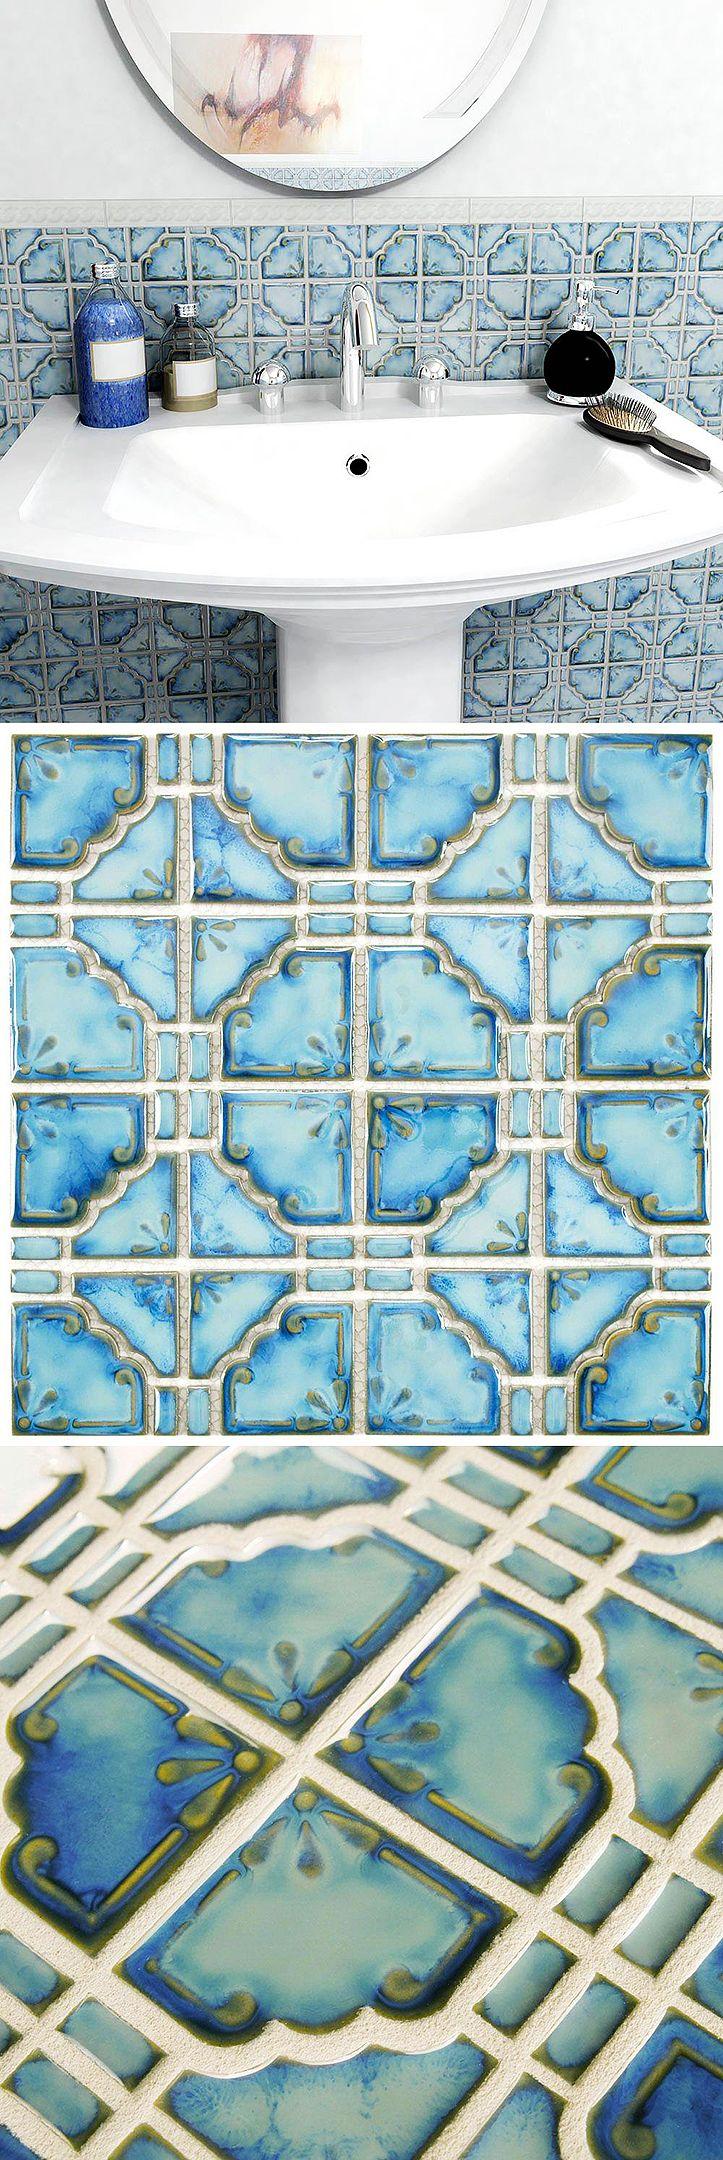 210 best Inspiring Tile images on Pinterest | Mosaic, Bathroom ideas ...